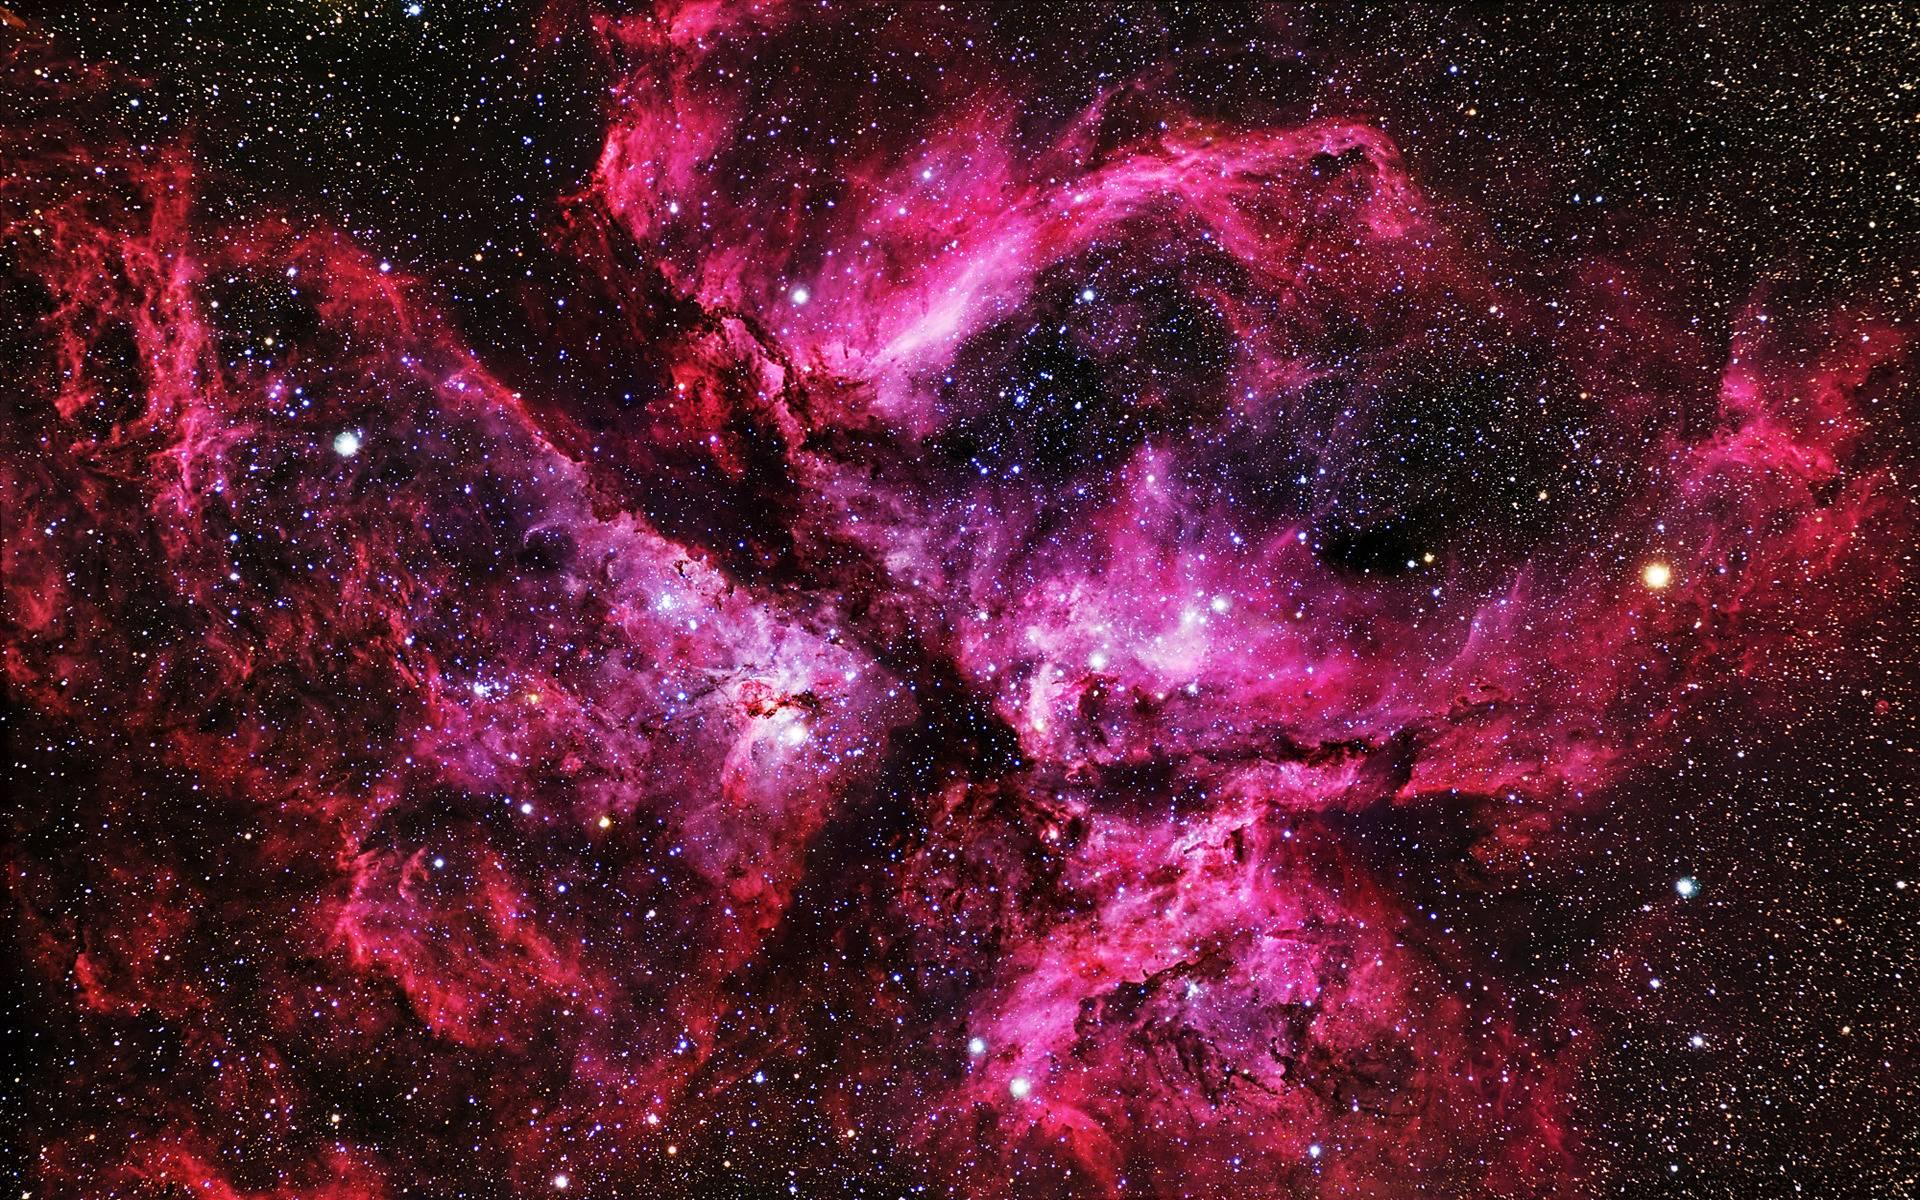 Galaxy Widescreen Wallpapers - Wallpaper Cave